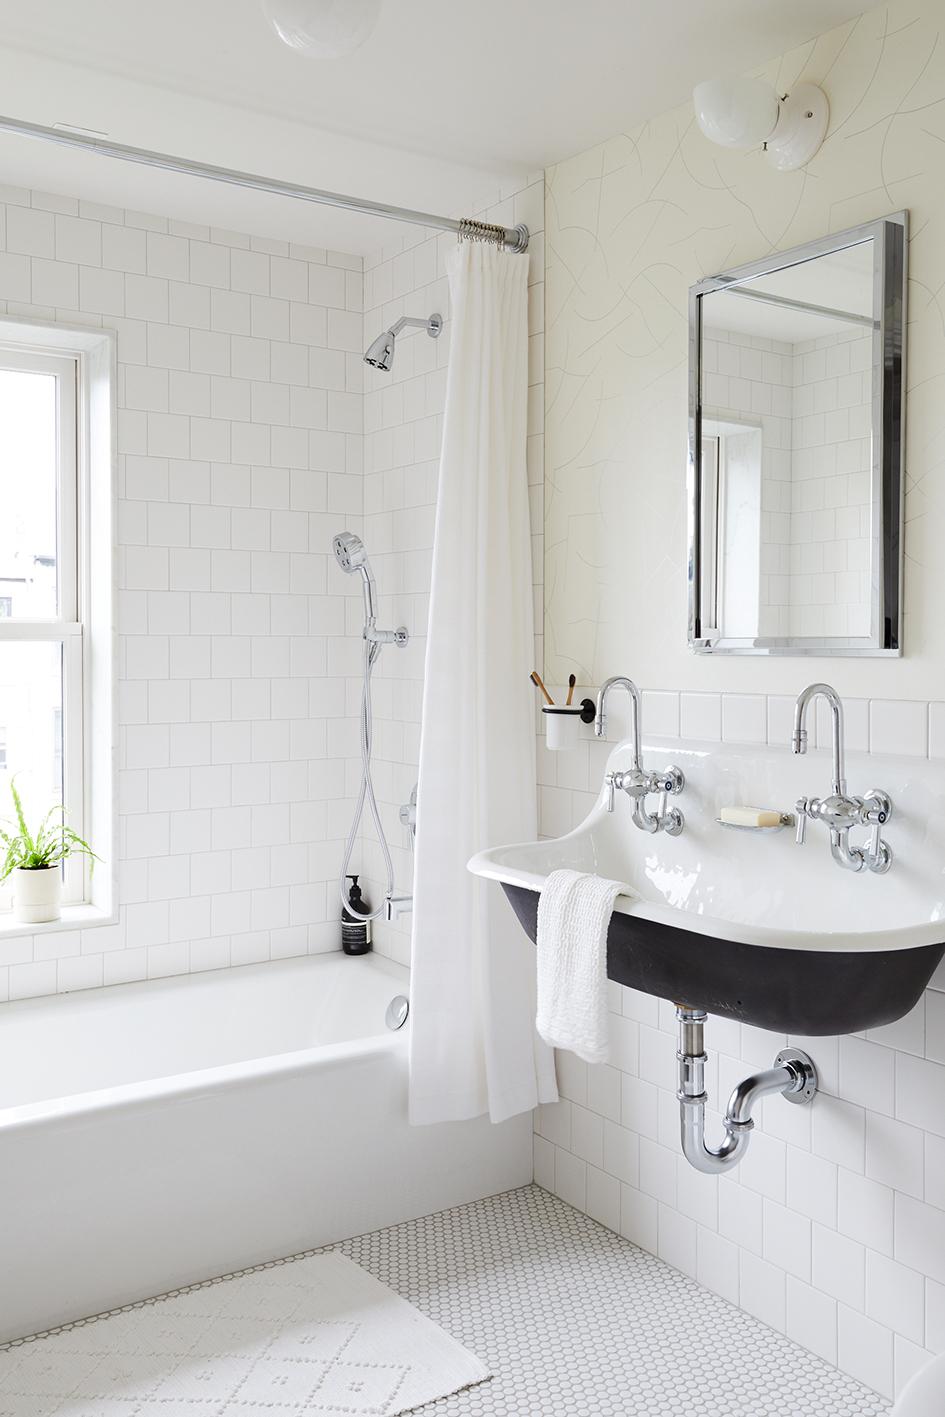 w. Kids Bath Slope_Townhouse_Bathroom_3rd_Floor_007.jpg